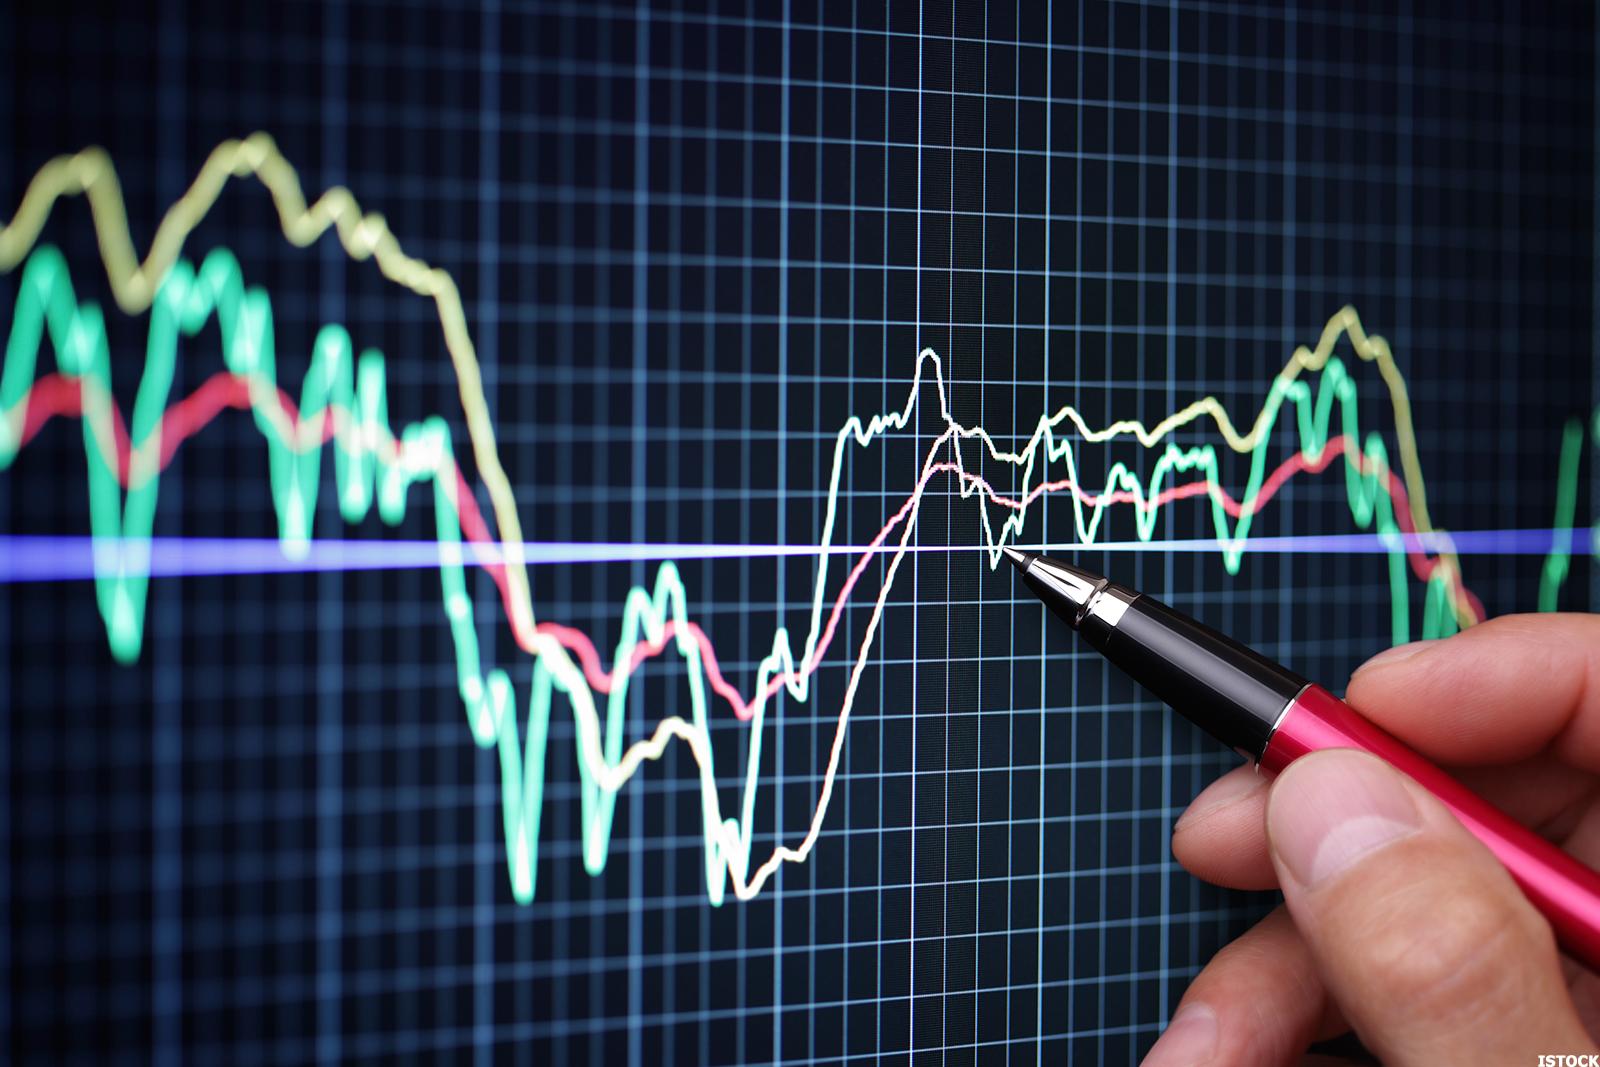 Relypsa Inc - :RLYP - Stock Quote & News - TheStreet